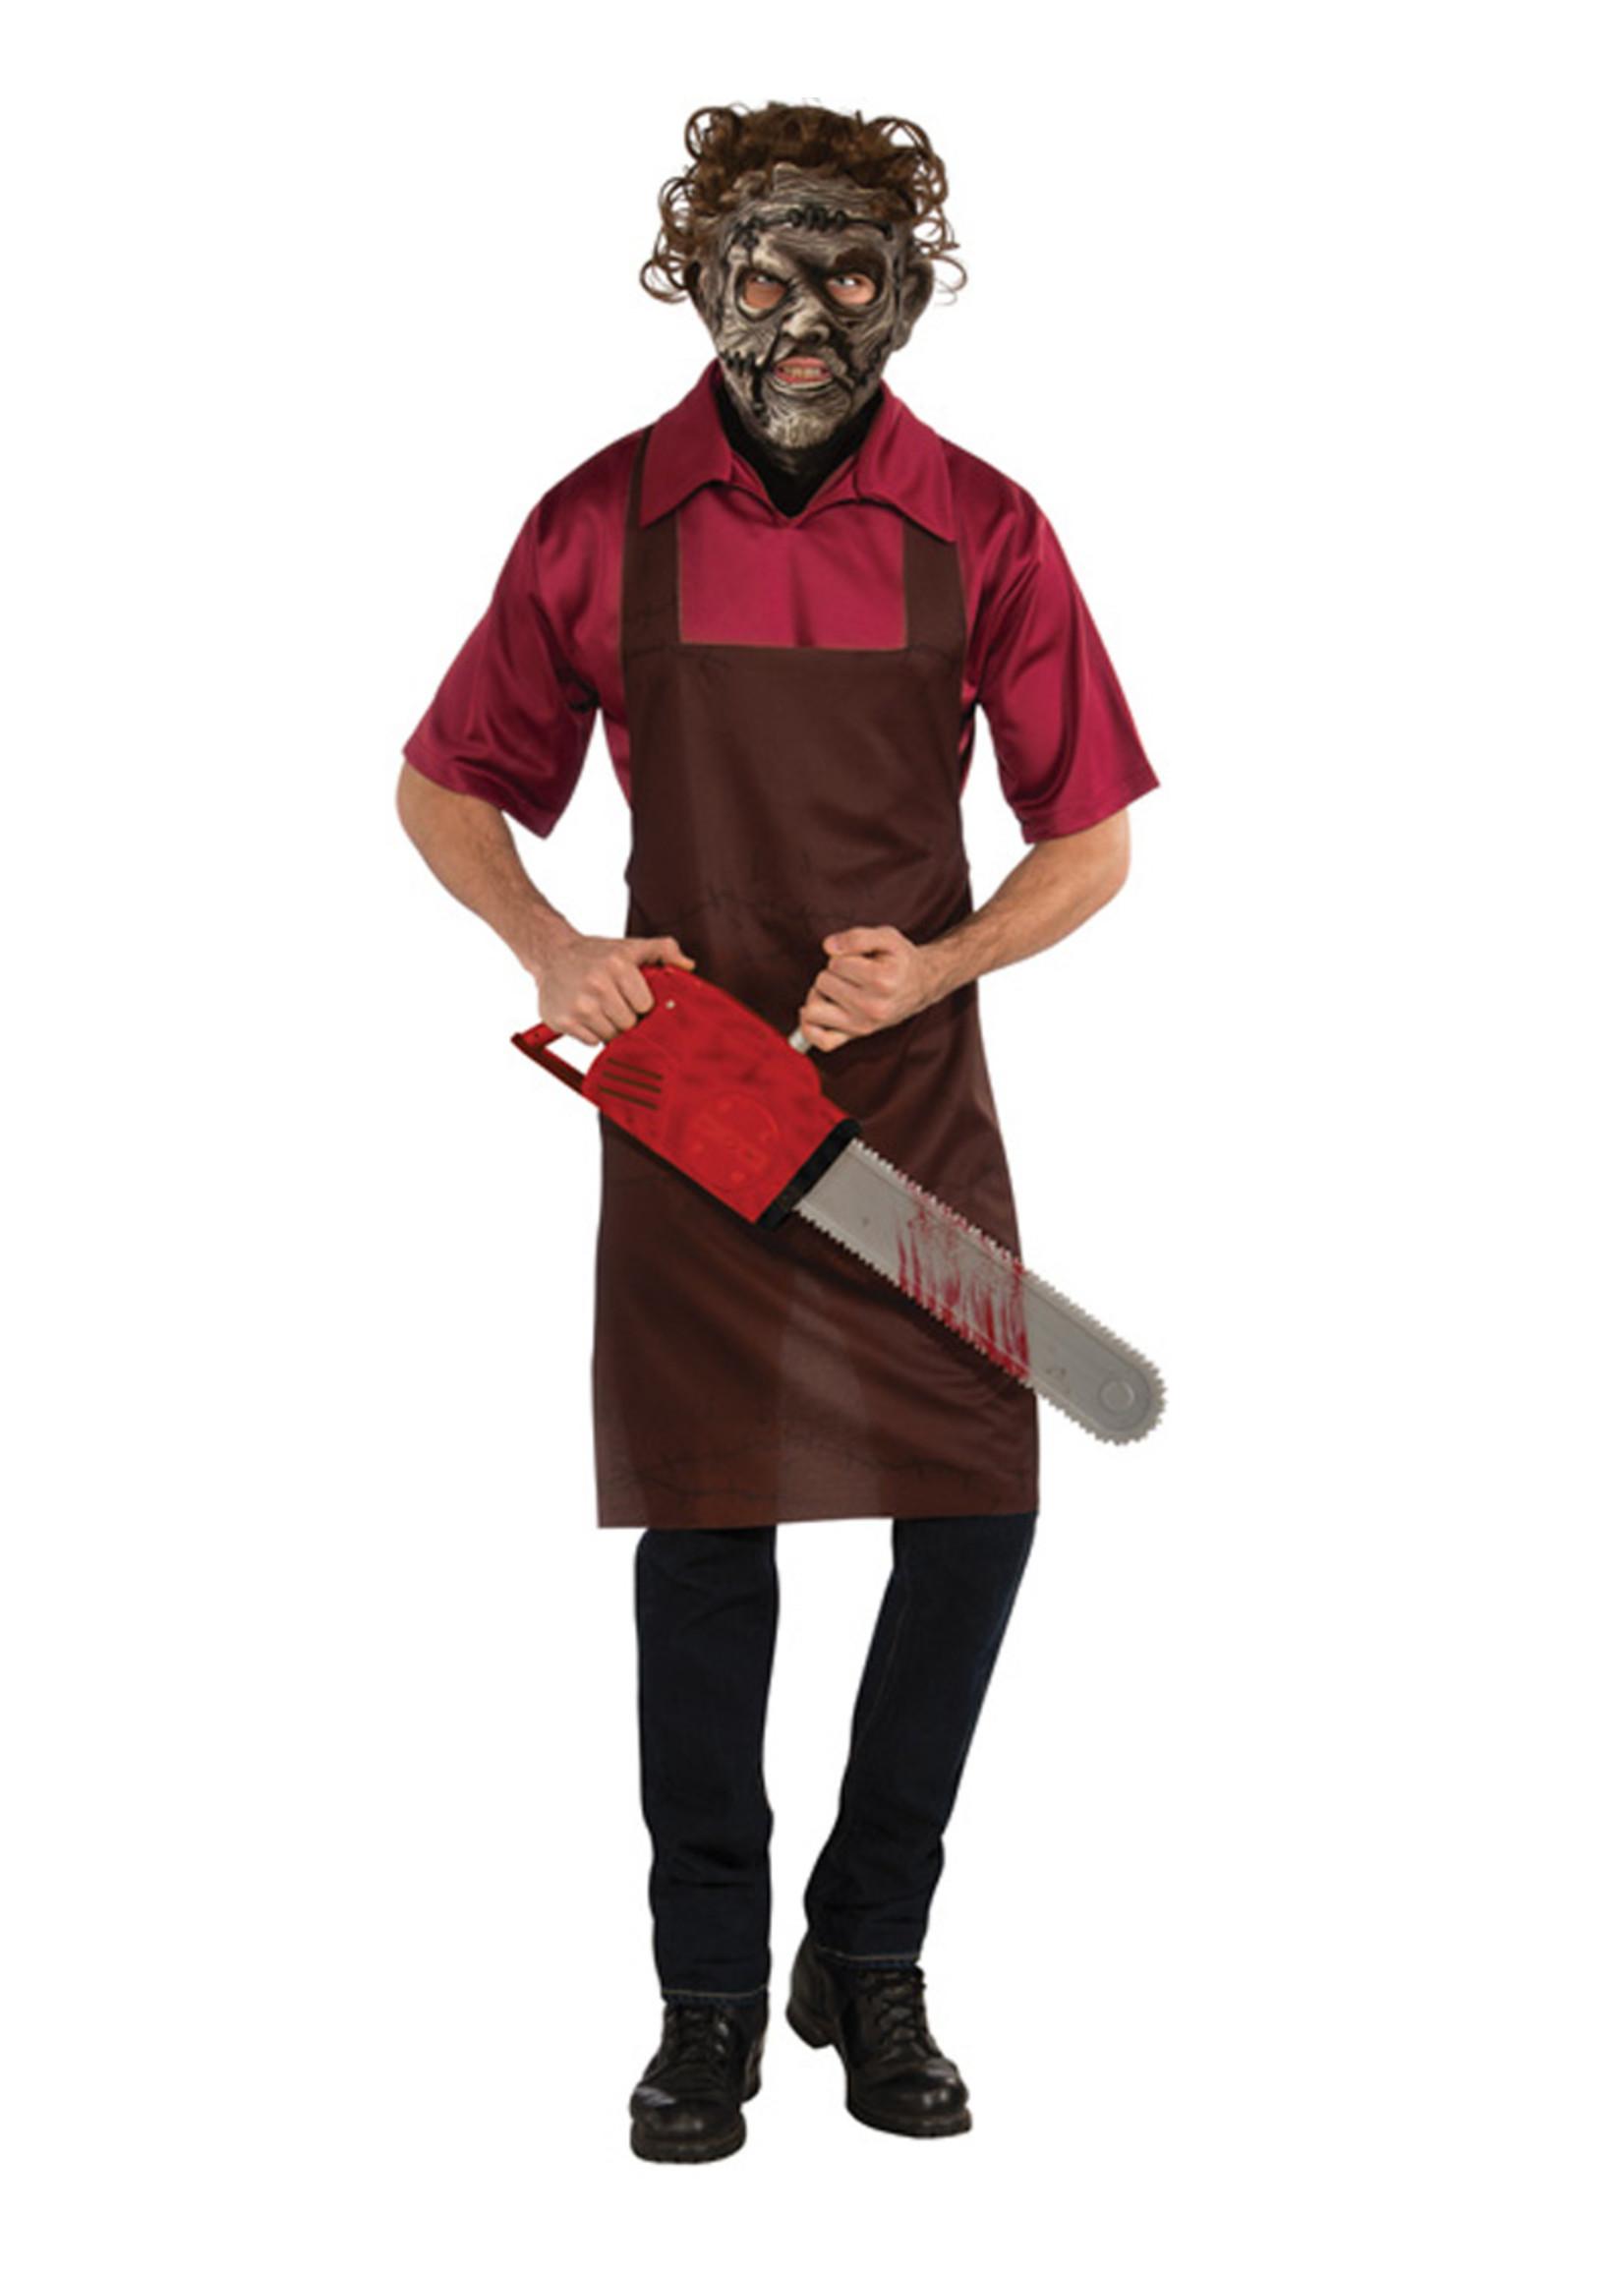 Leatherface Costume - Men's